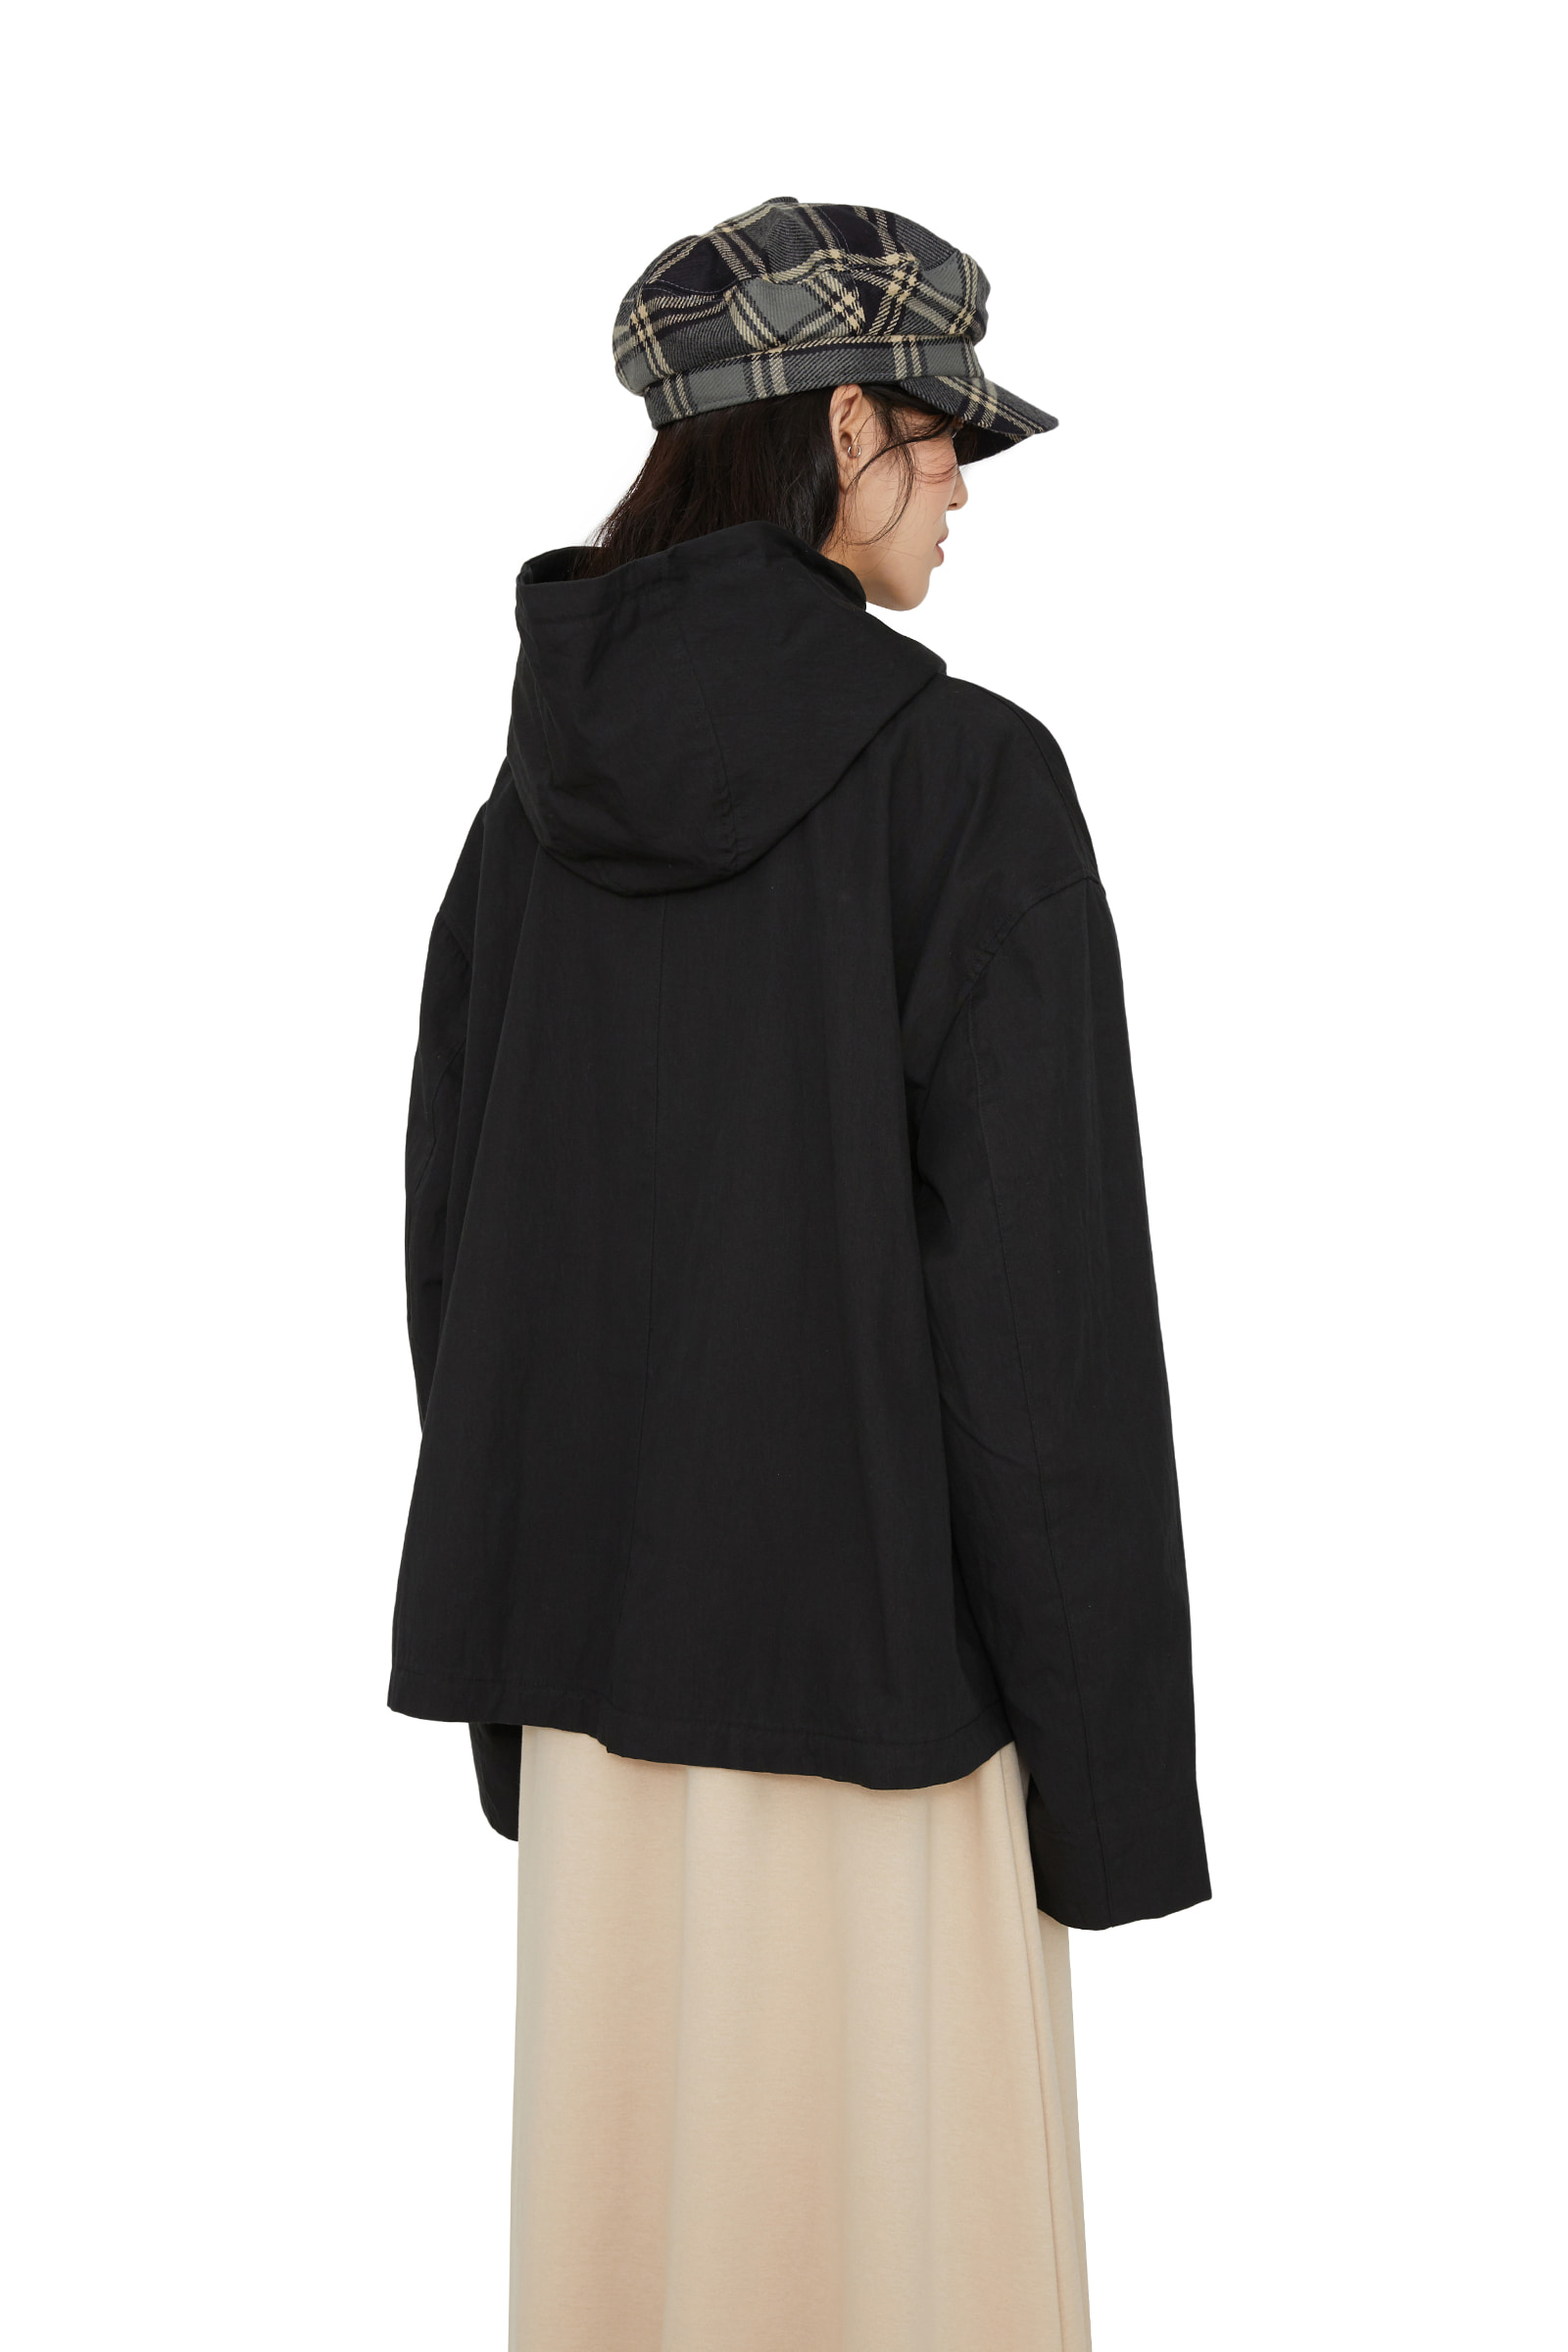 Bare overfit bomber hooded jacket